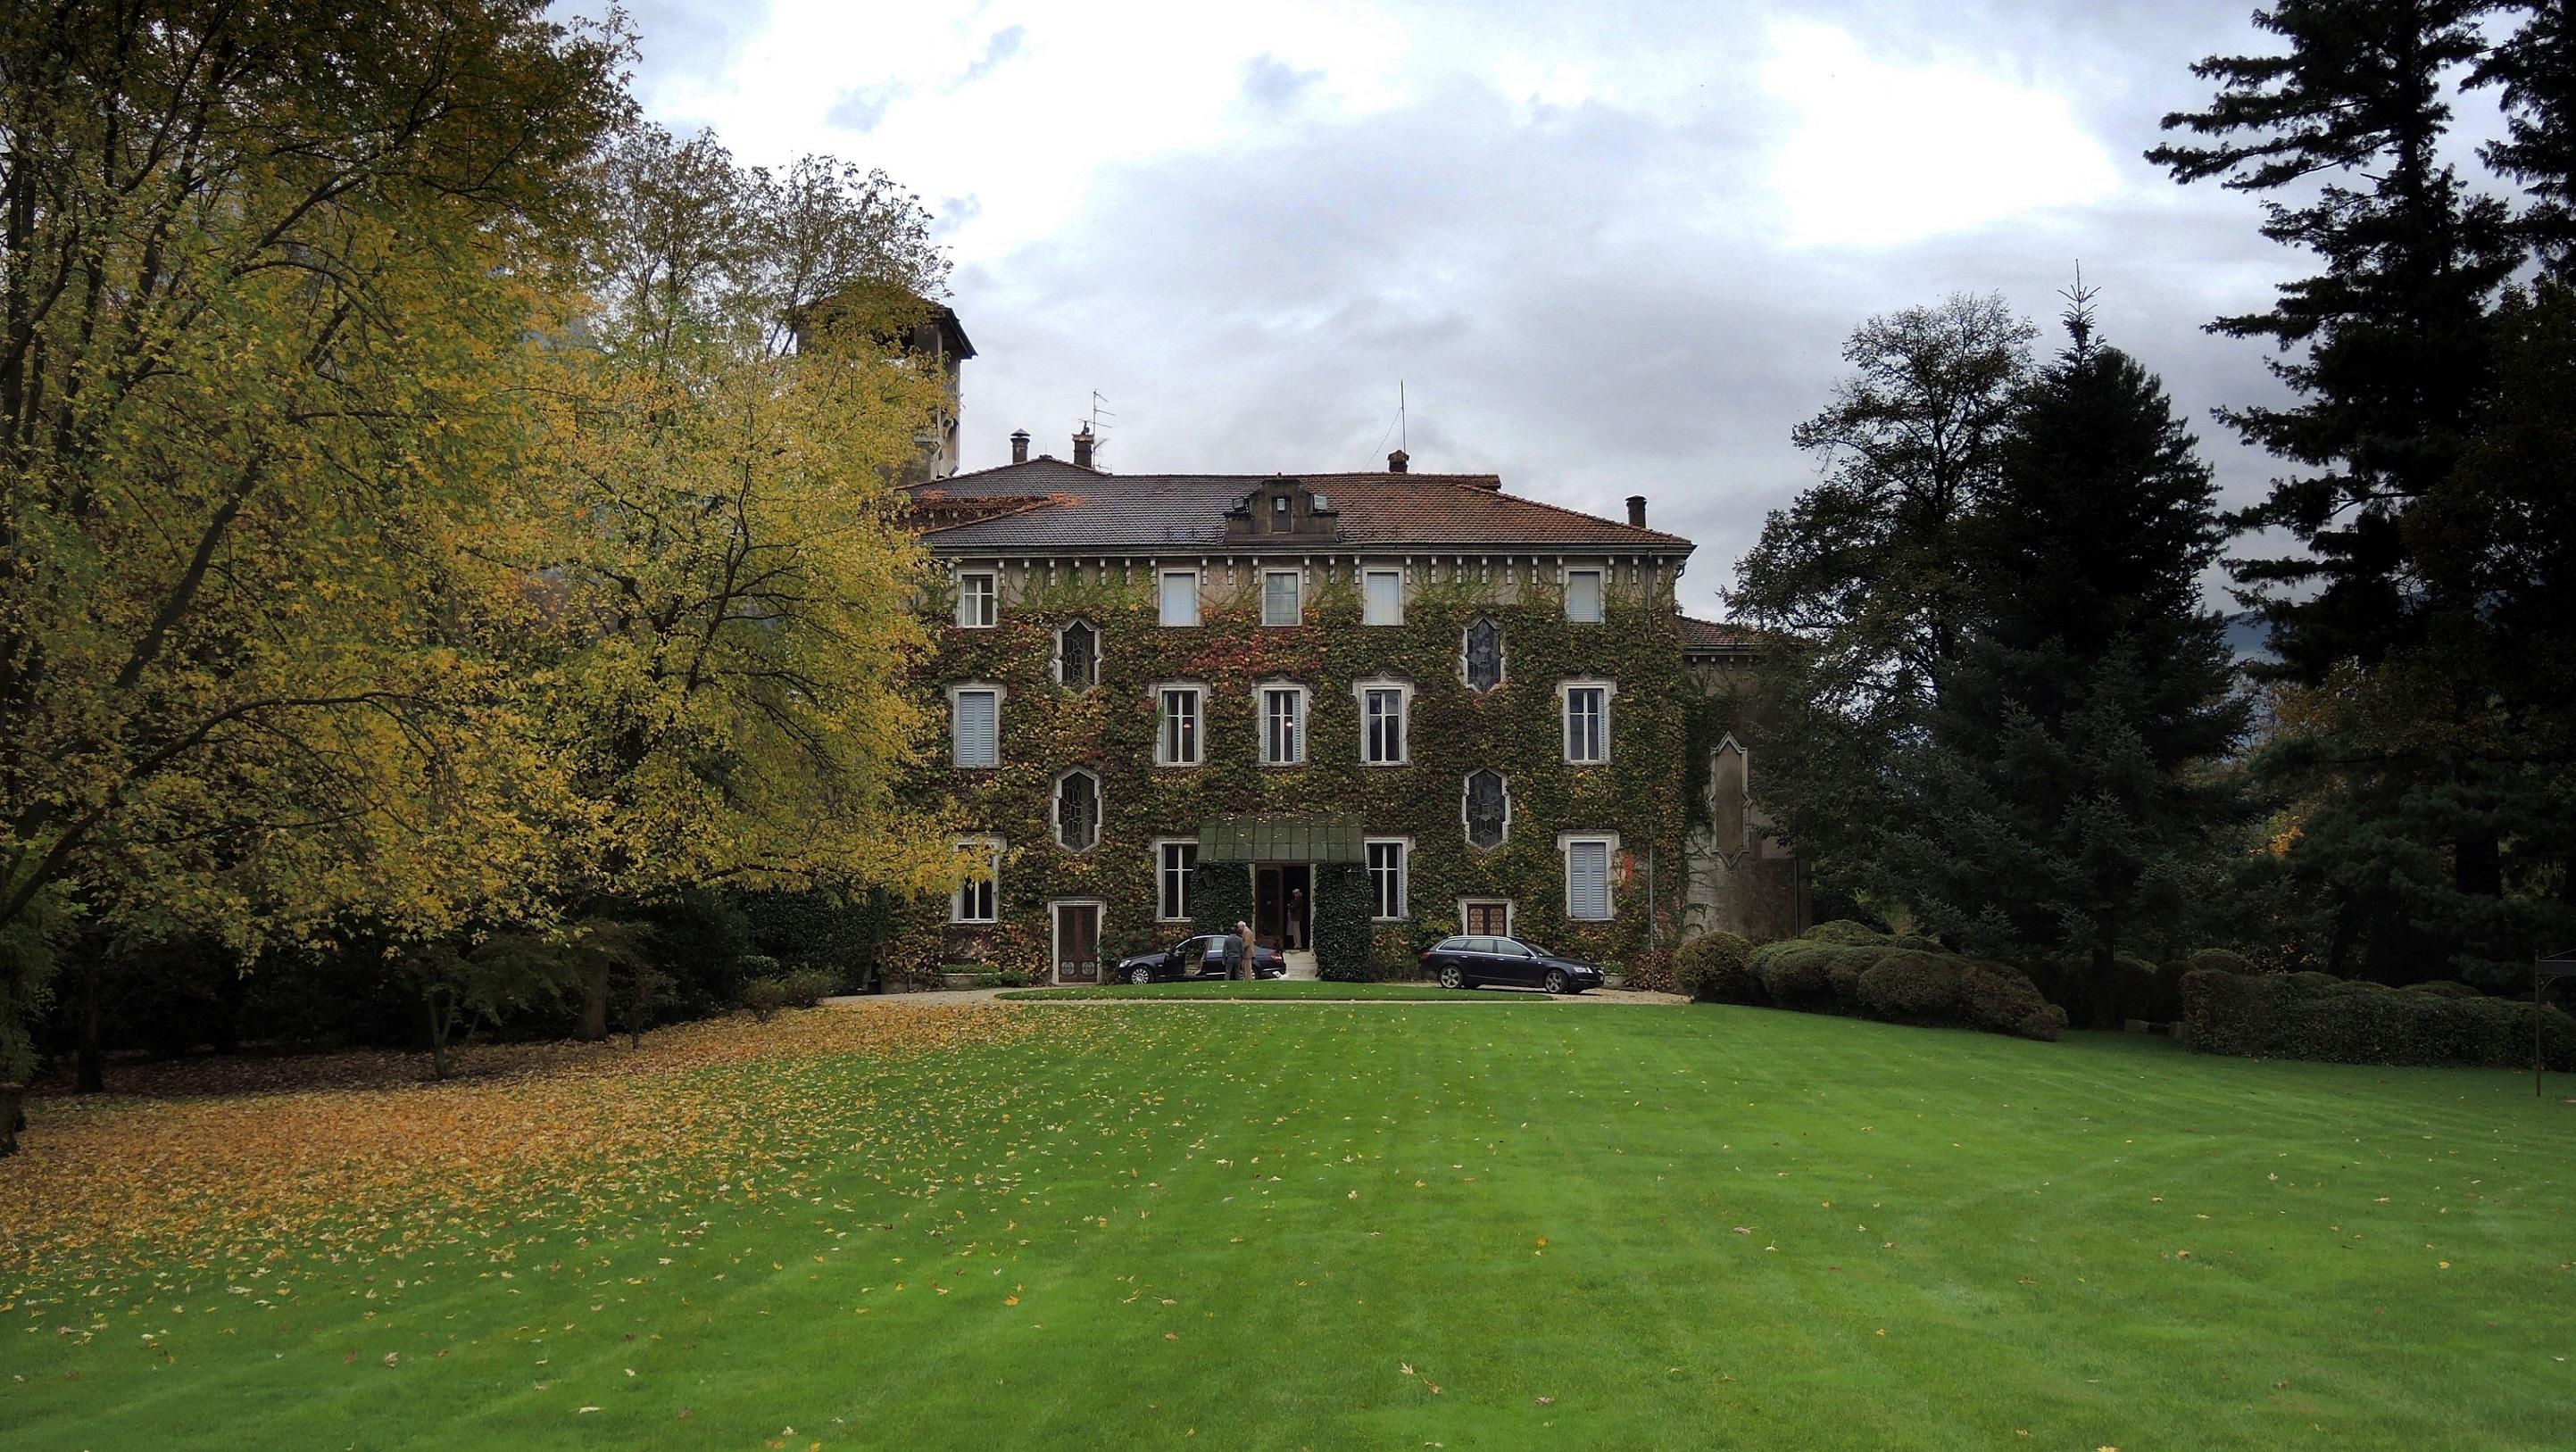 04-Trentino Doc 2014 Nov (33)